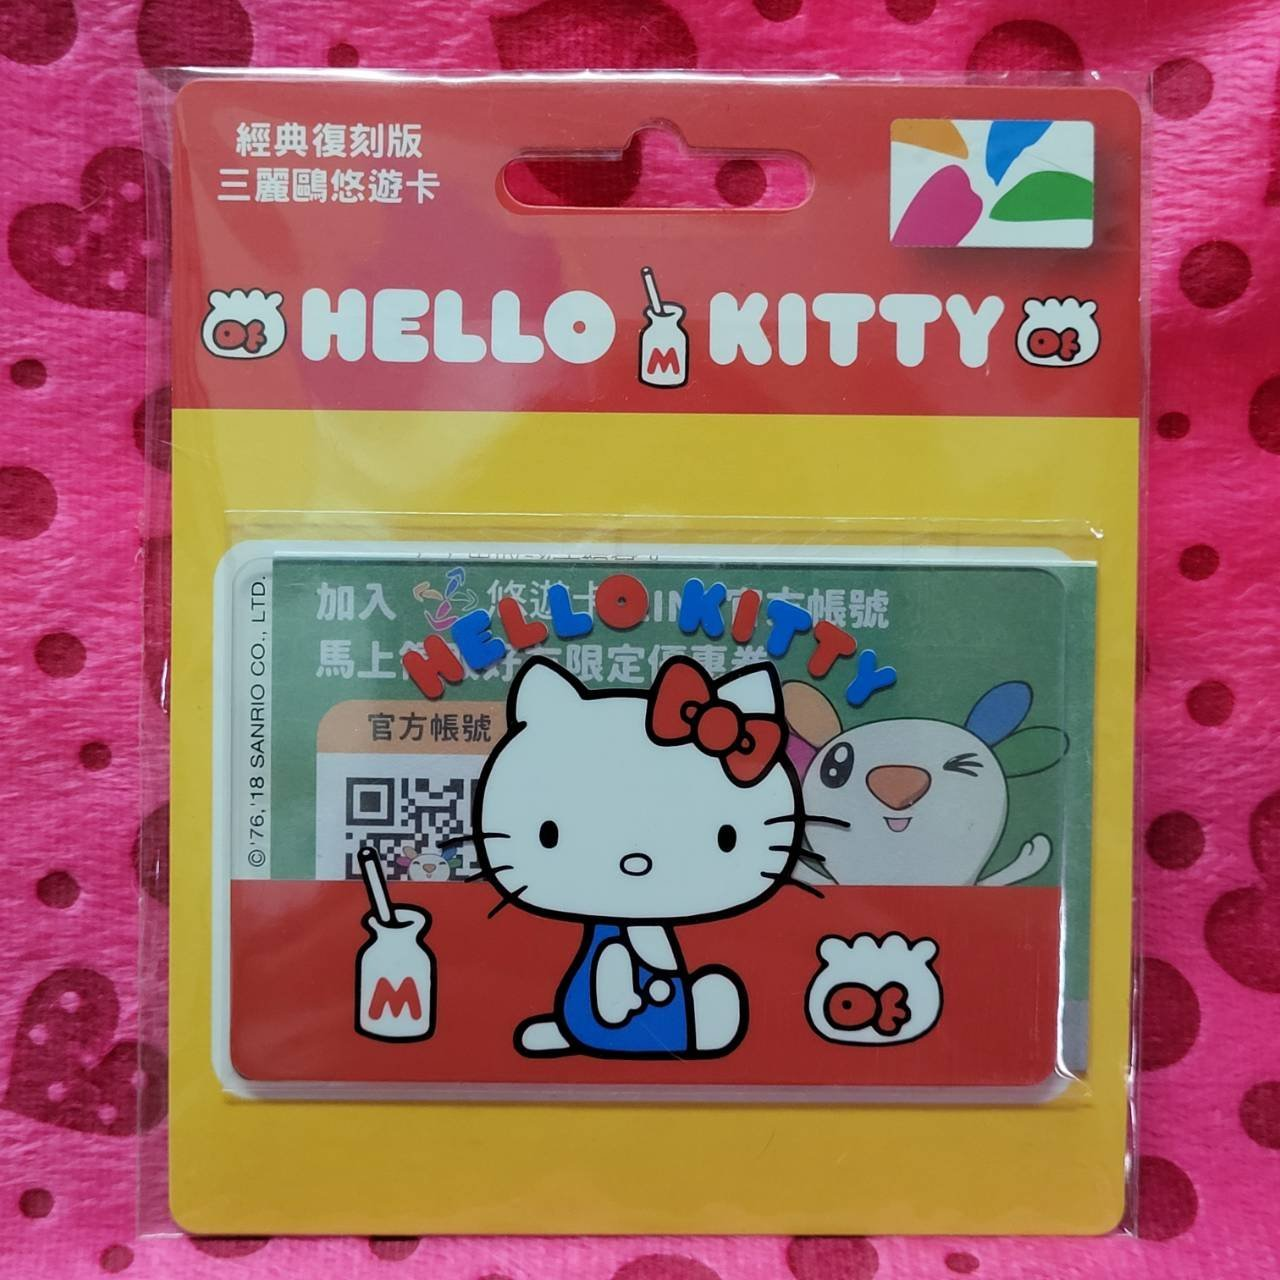 HELLO KITTY悠遊卡-復刻版-100204